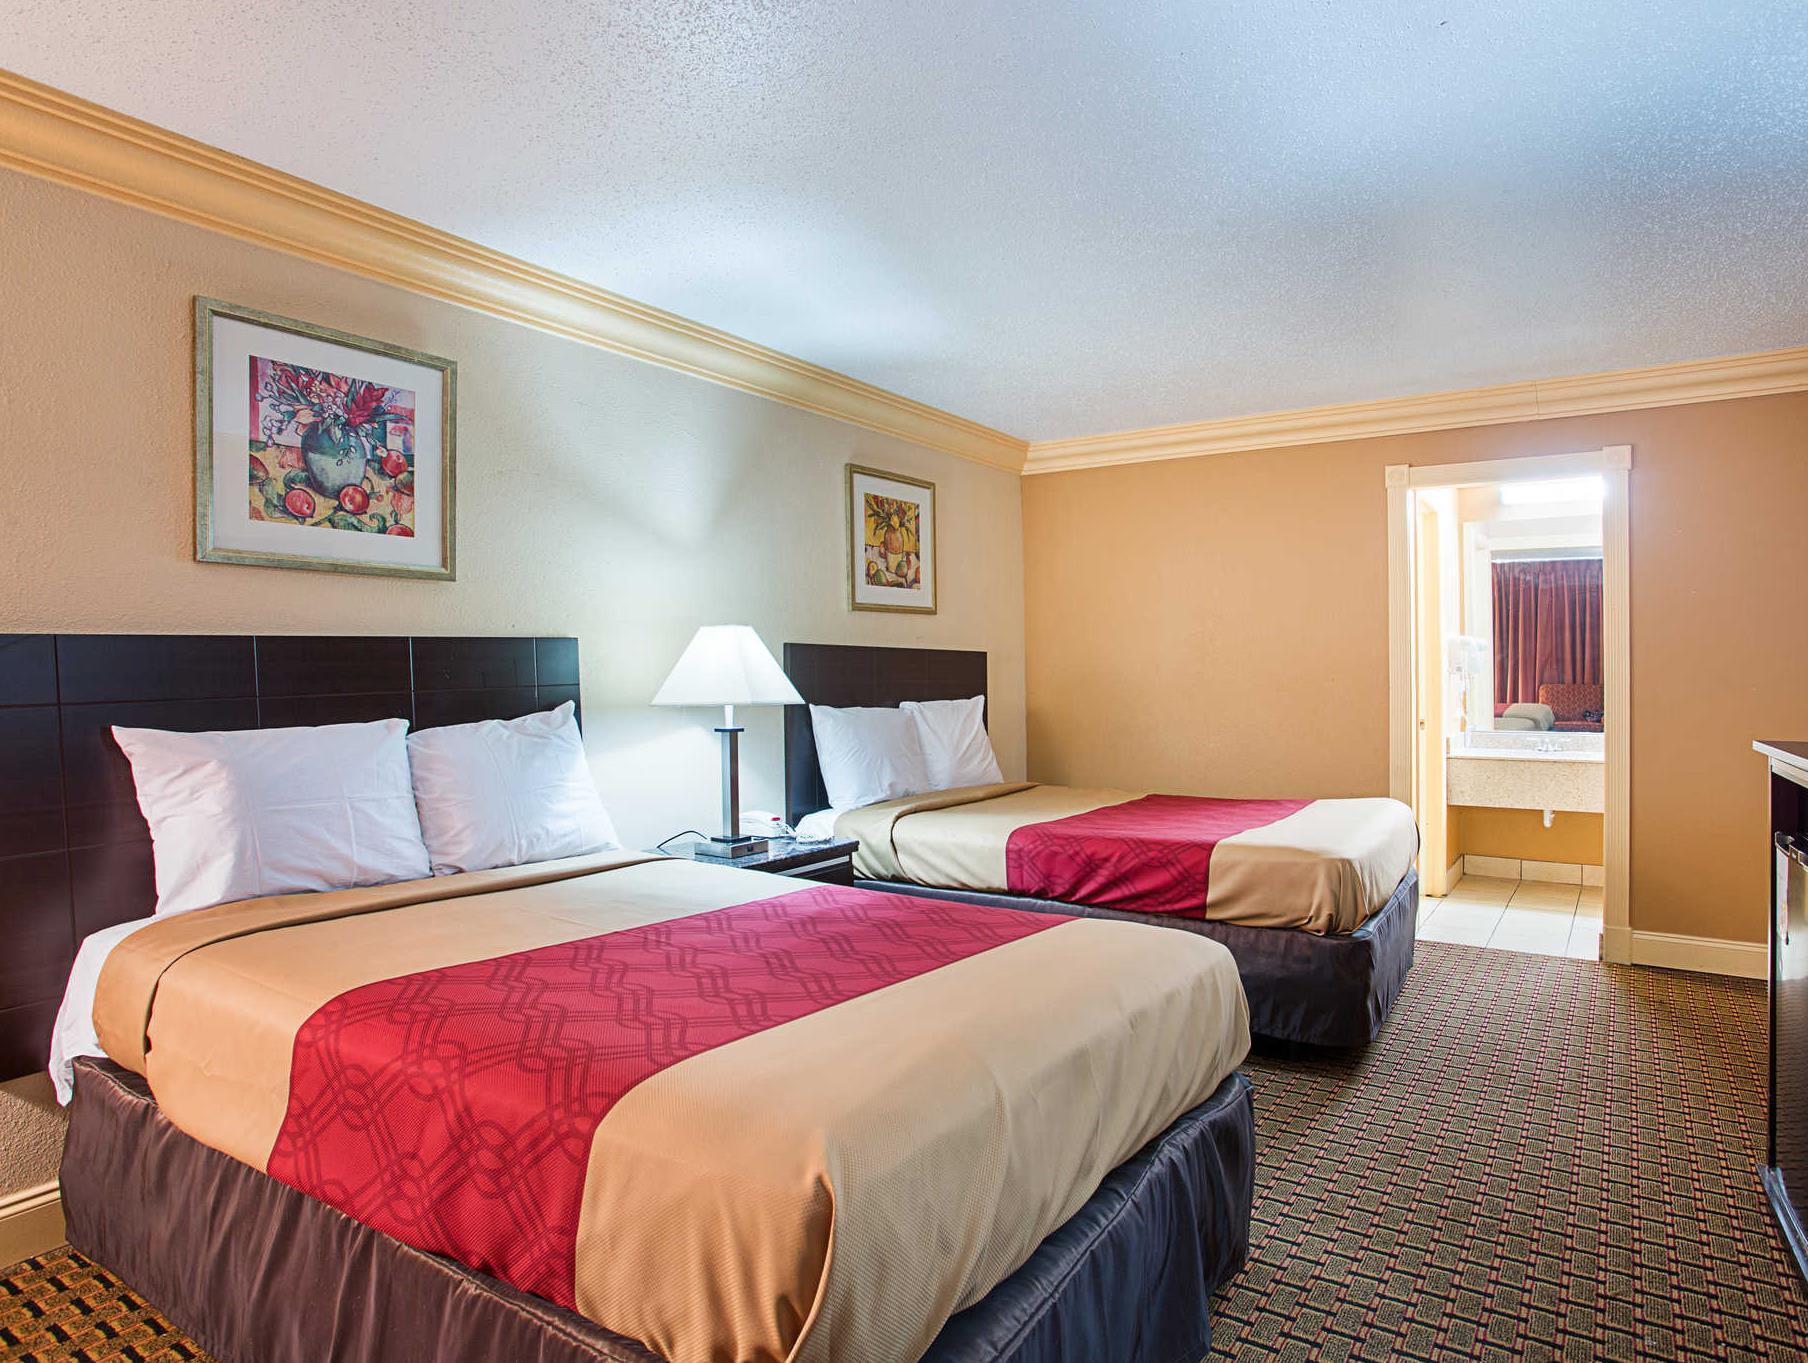 Rodeway Inn & Suites Birmingham I 59 Exit 134